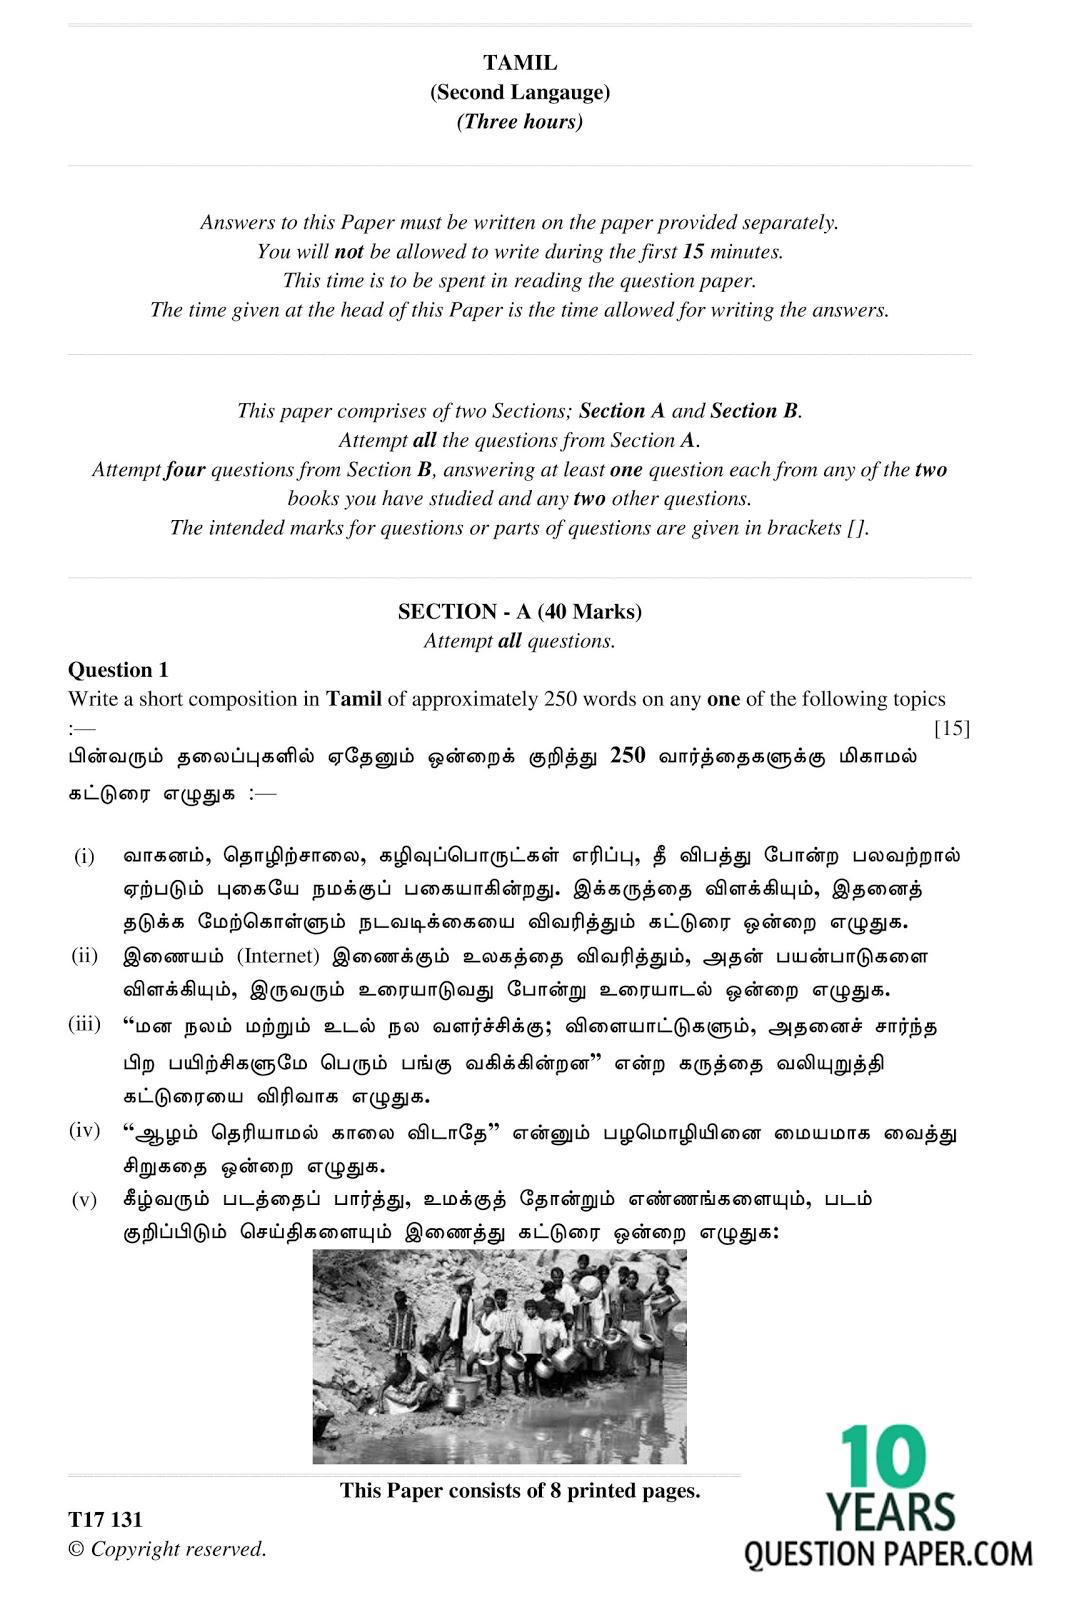 ICSE 2017 : Tamil Board Exam Paper